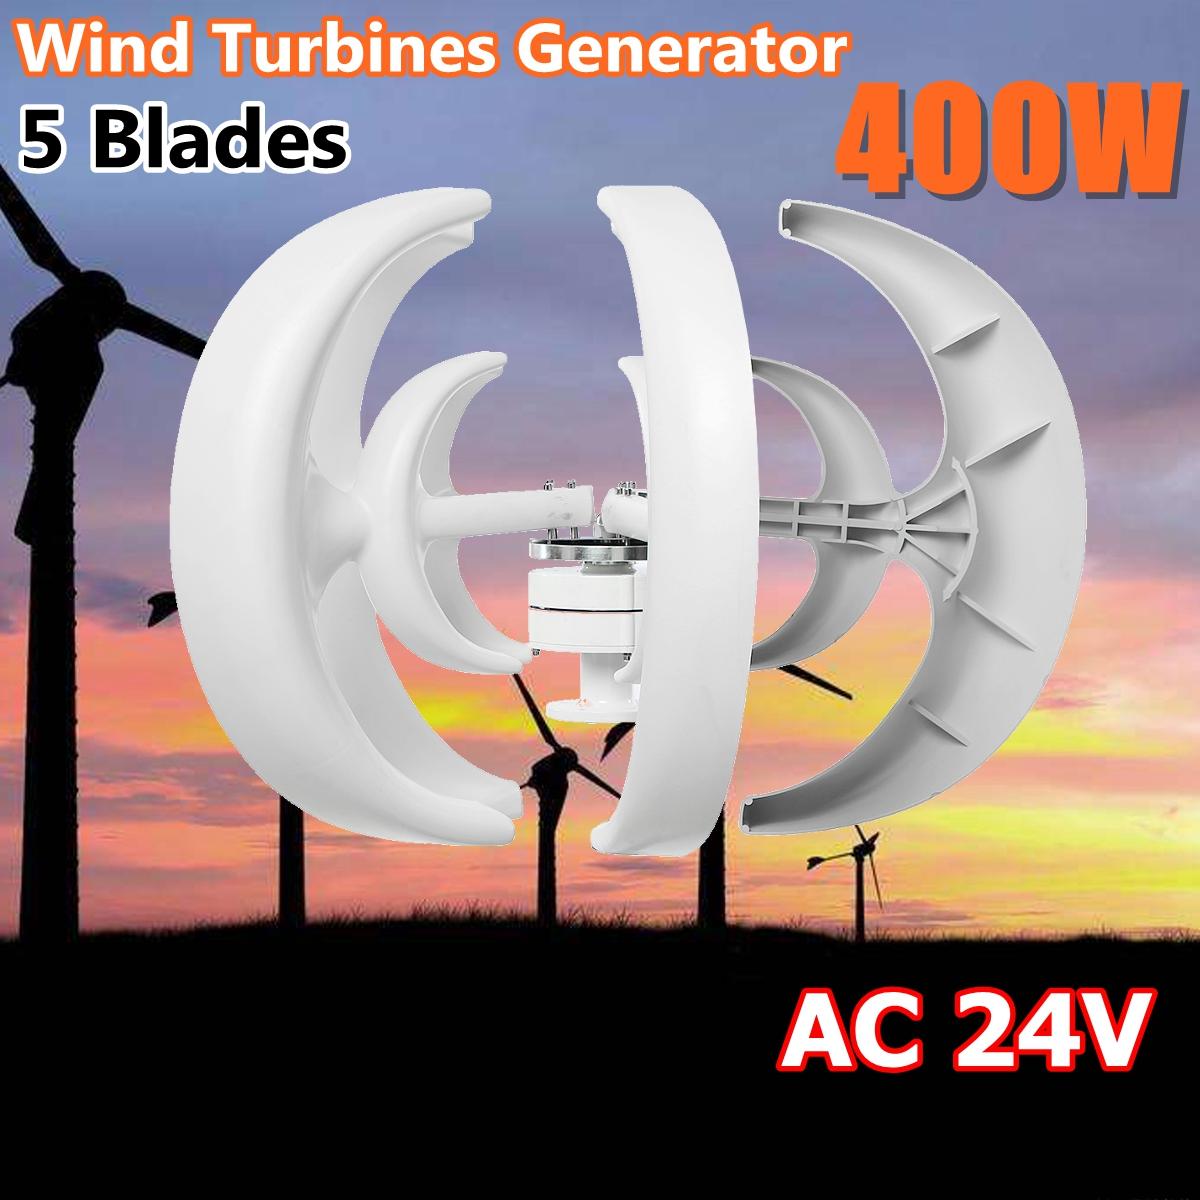 400W AC 24V 5 Blades Lanterns Wind Turbine Generator Vertical Axis Windmill,White by